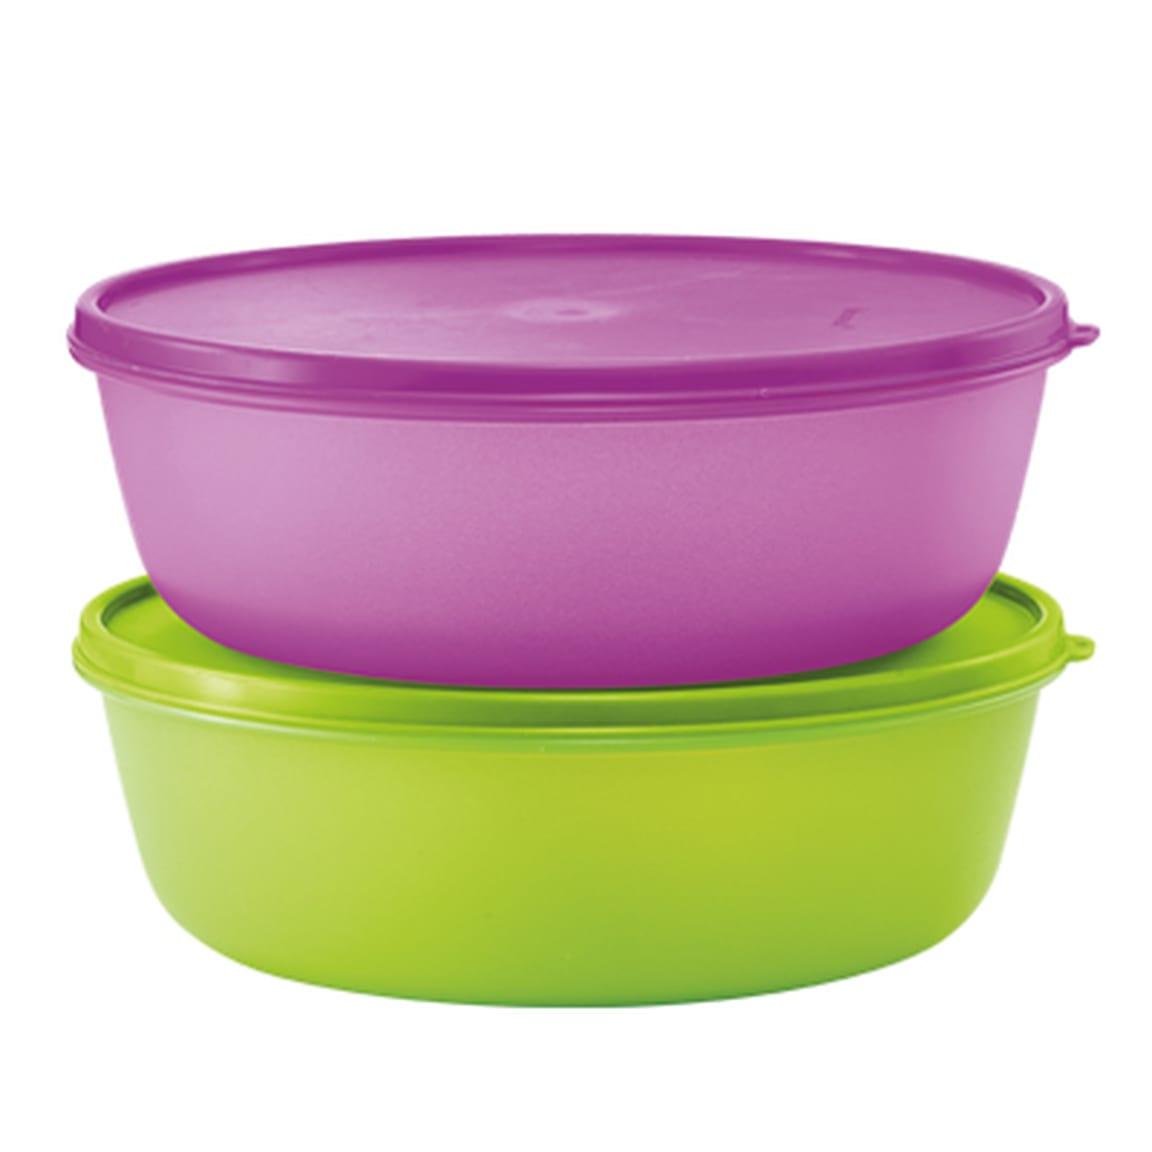 Modular Bowls (4) 600ml